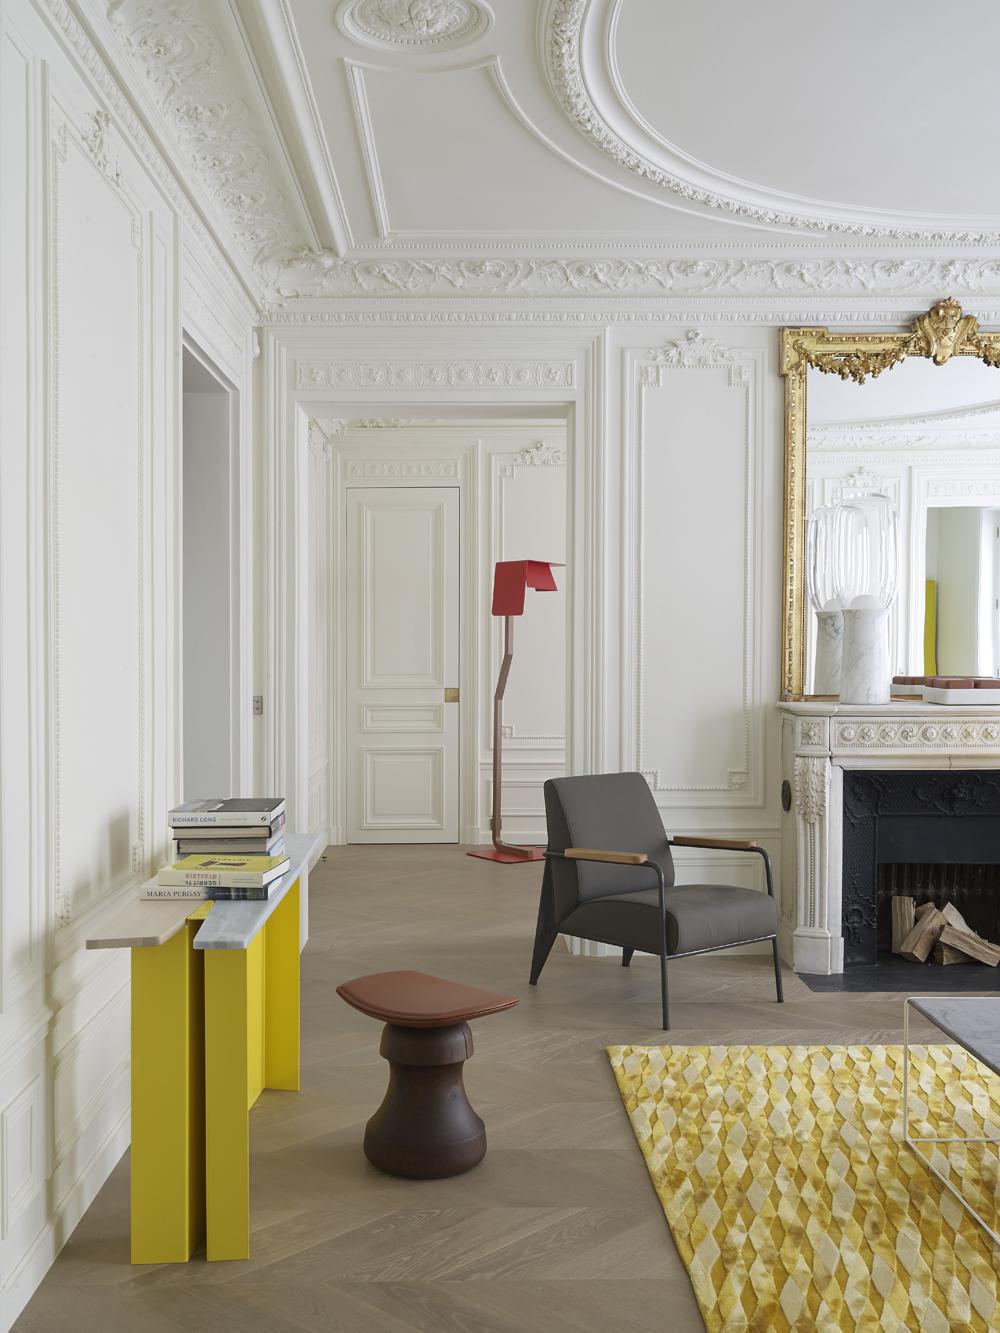 christophe-delcourt-interior-inspiration-7.jpg